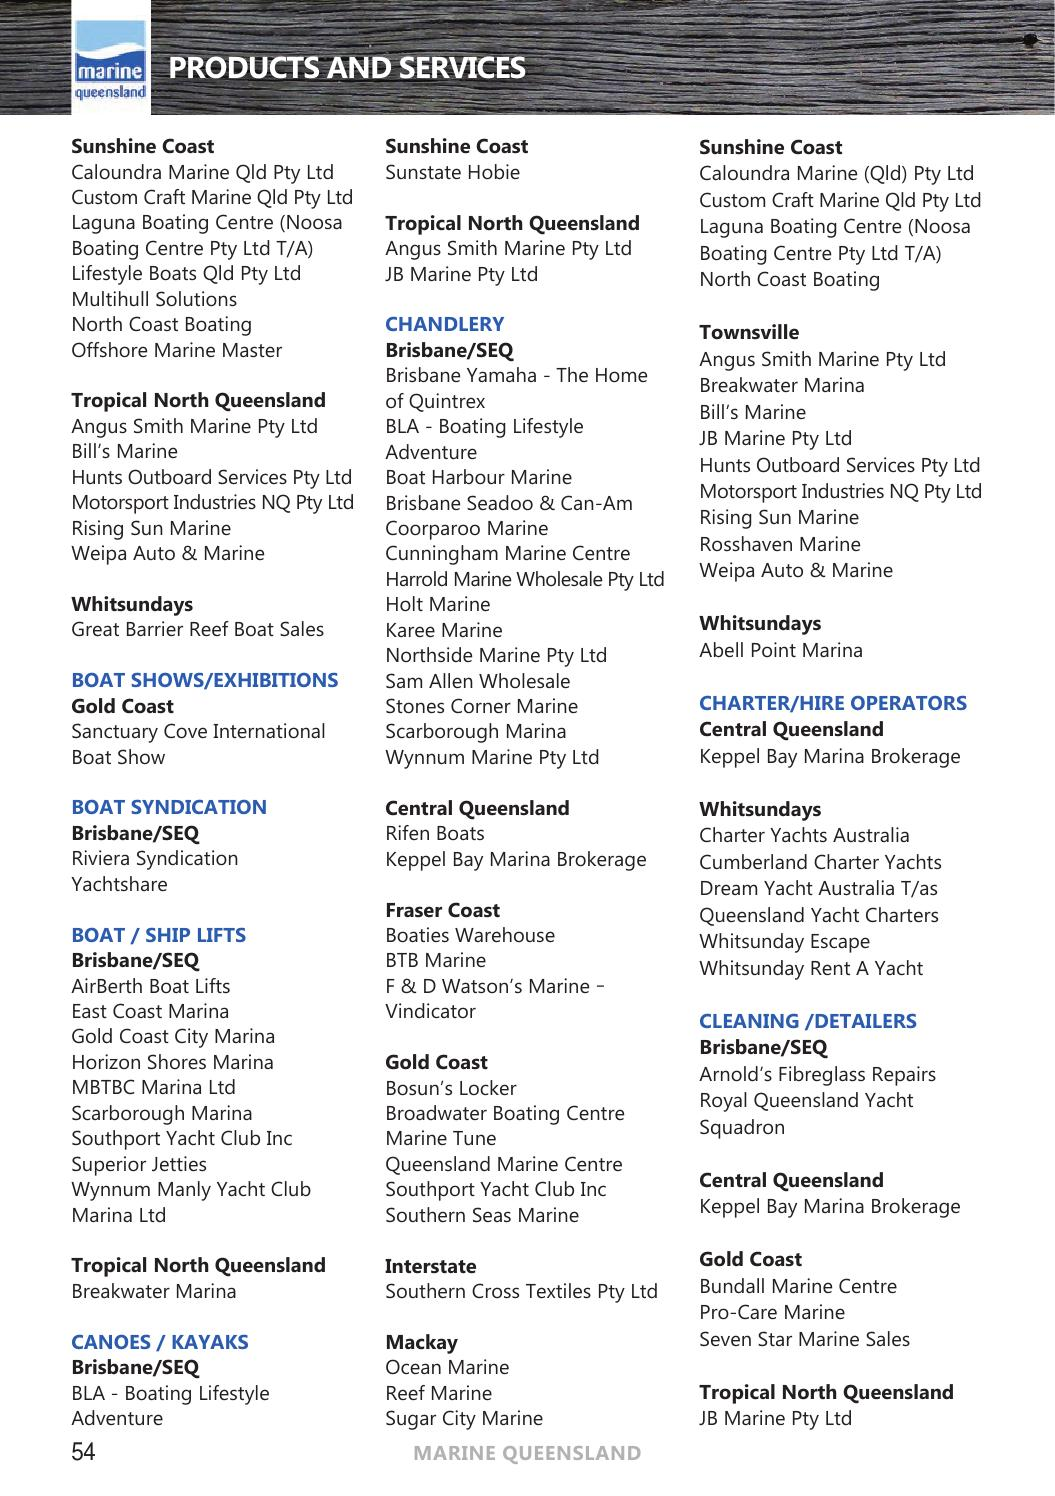 Marine Queensland Marine Directory 2015/16 by